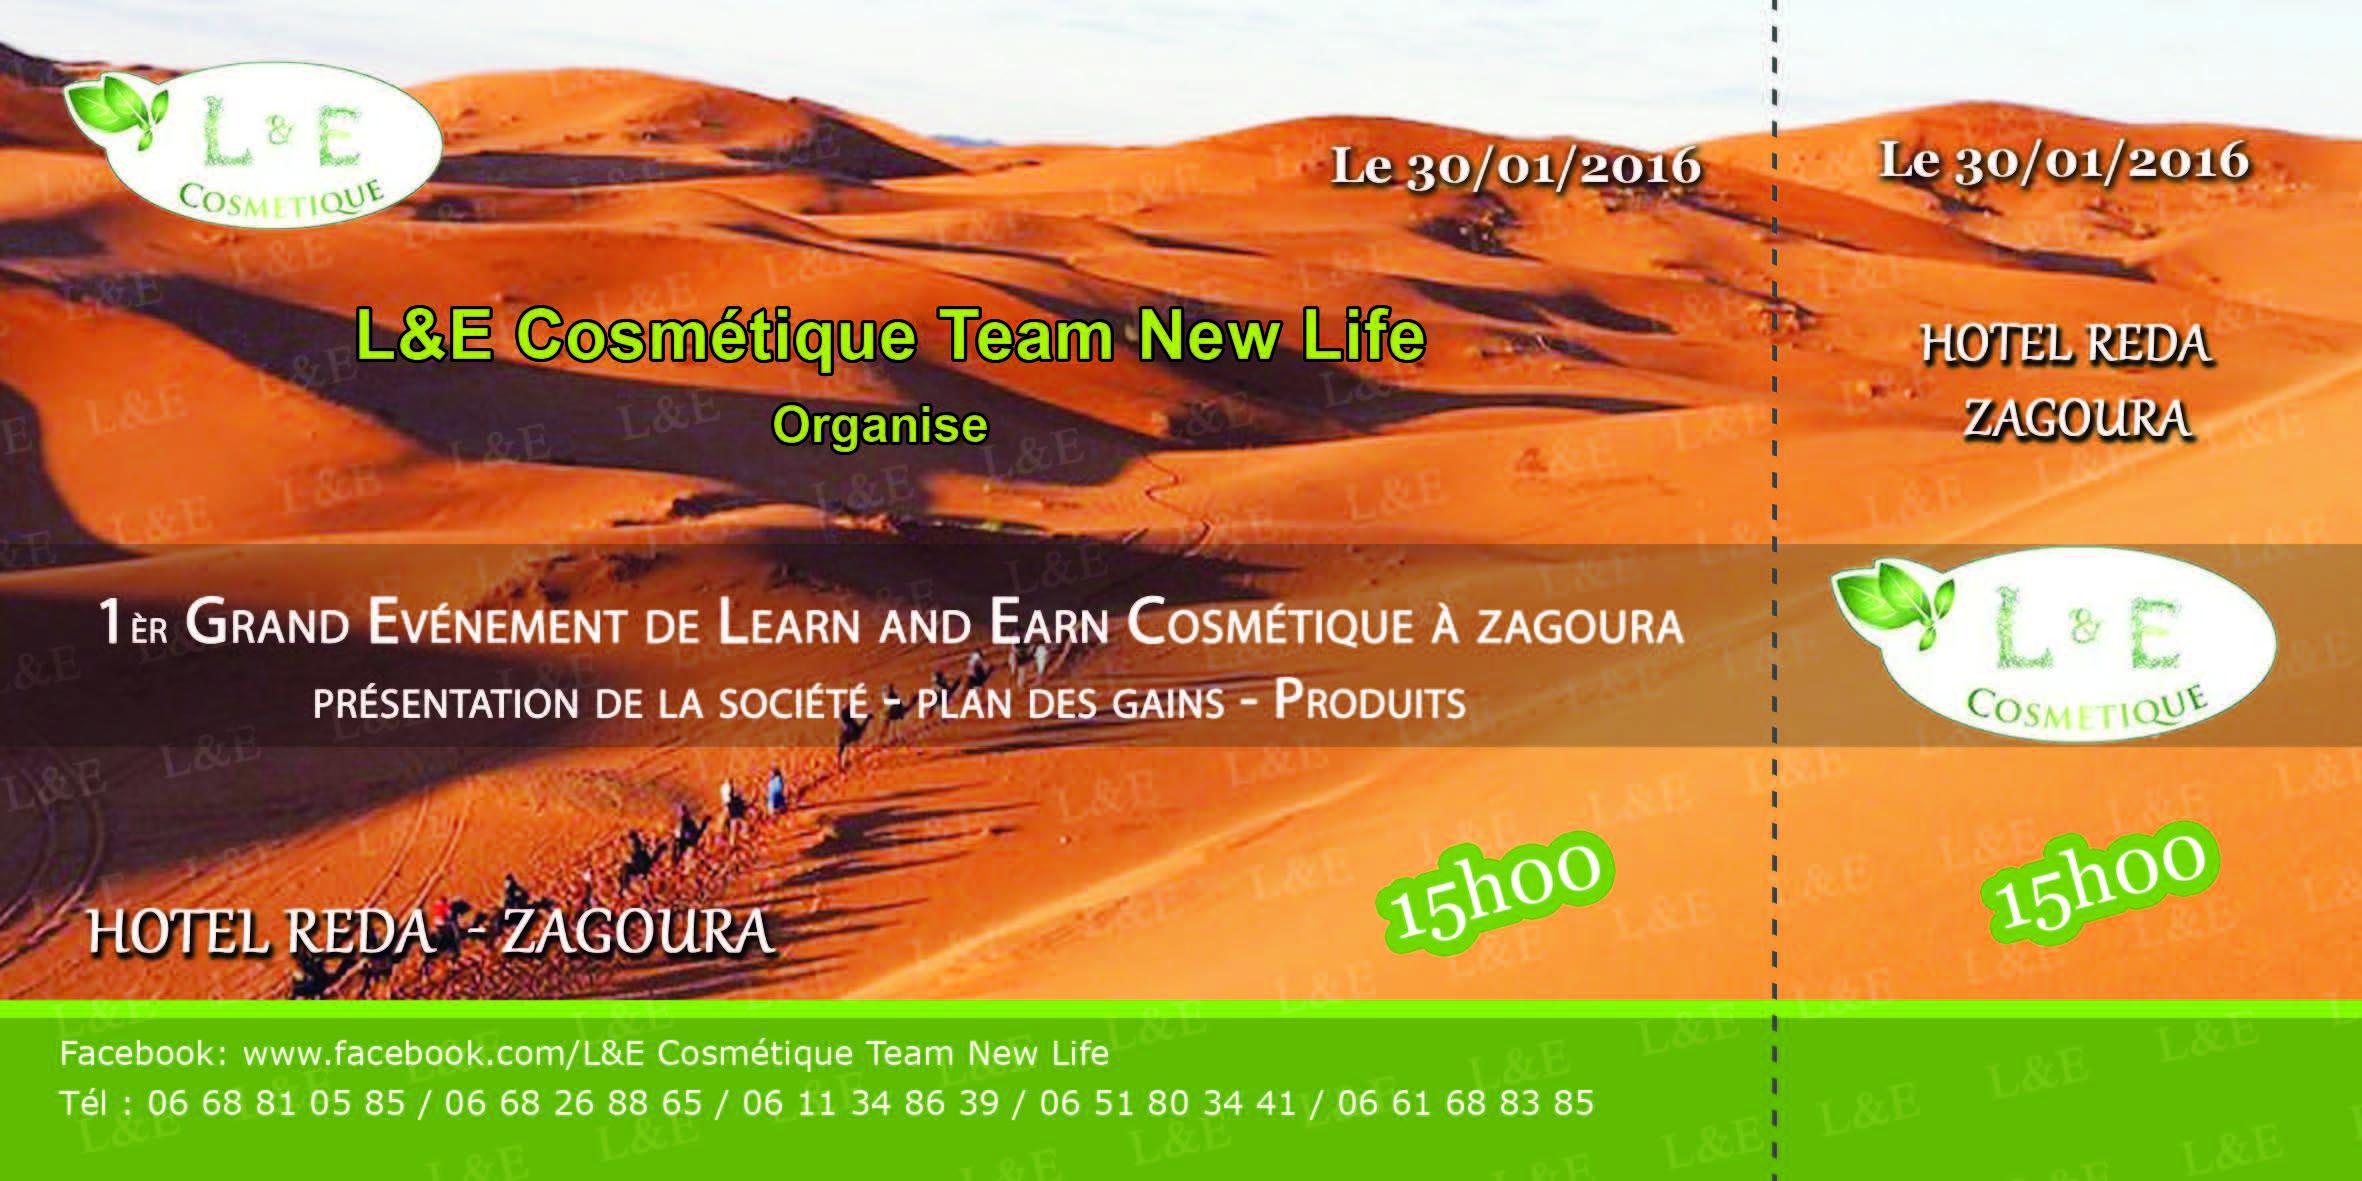 "زاكورة: شركة ""لُورَنْ أَنْدْ أُورَنْ L&E cosmétique"" تنظيم لقاءاً تواصلياً"